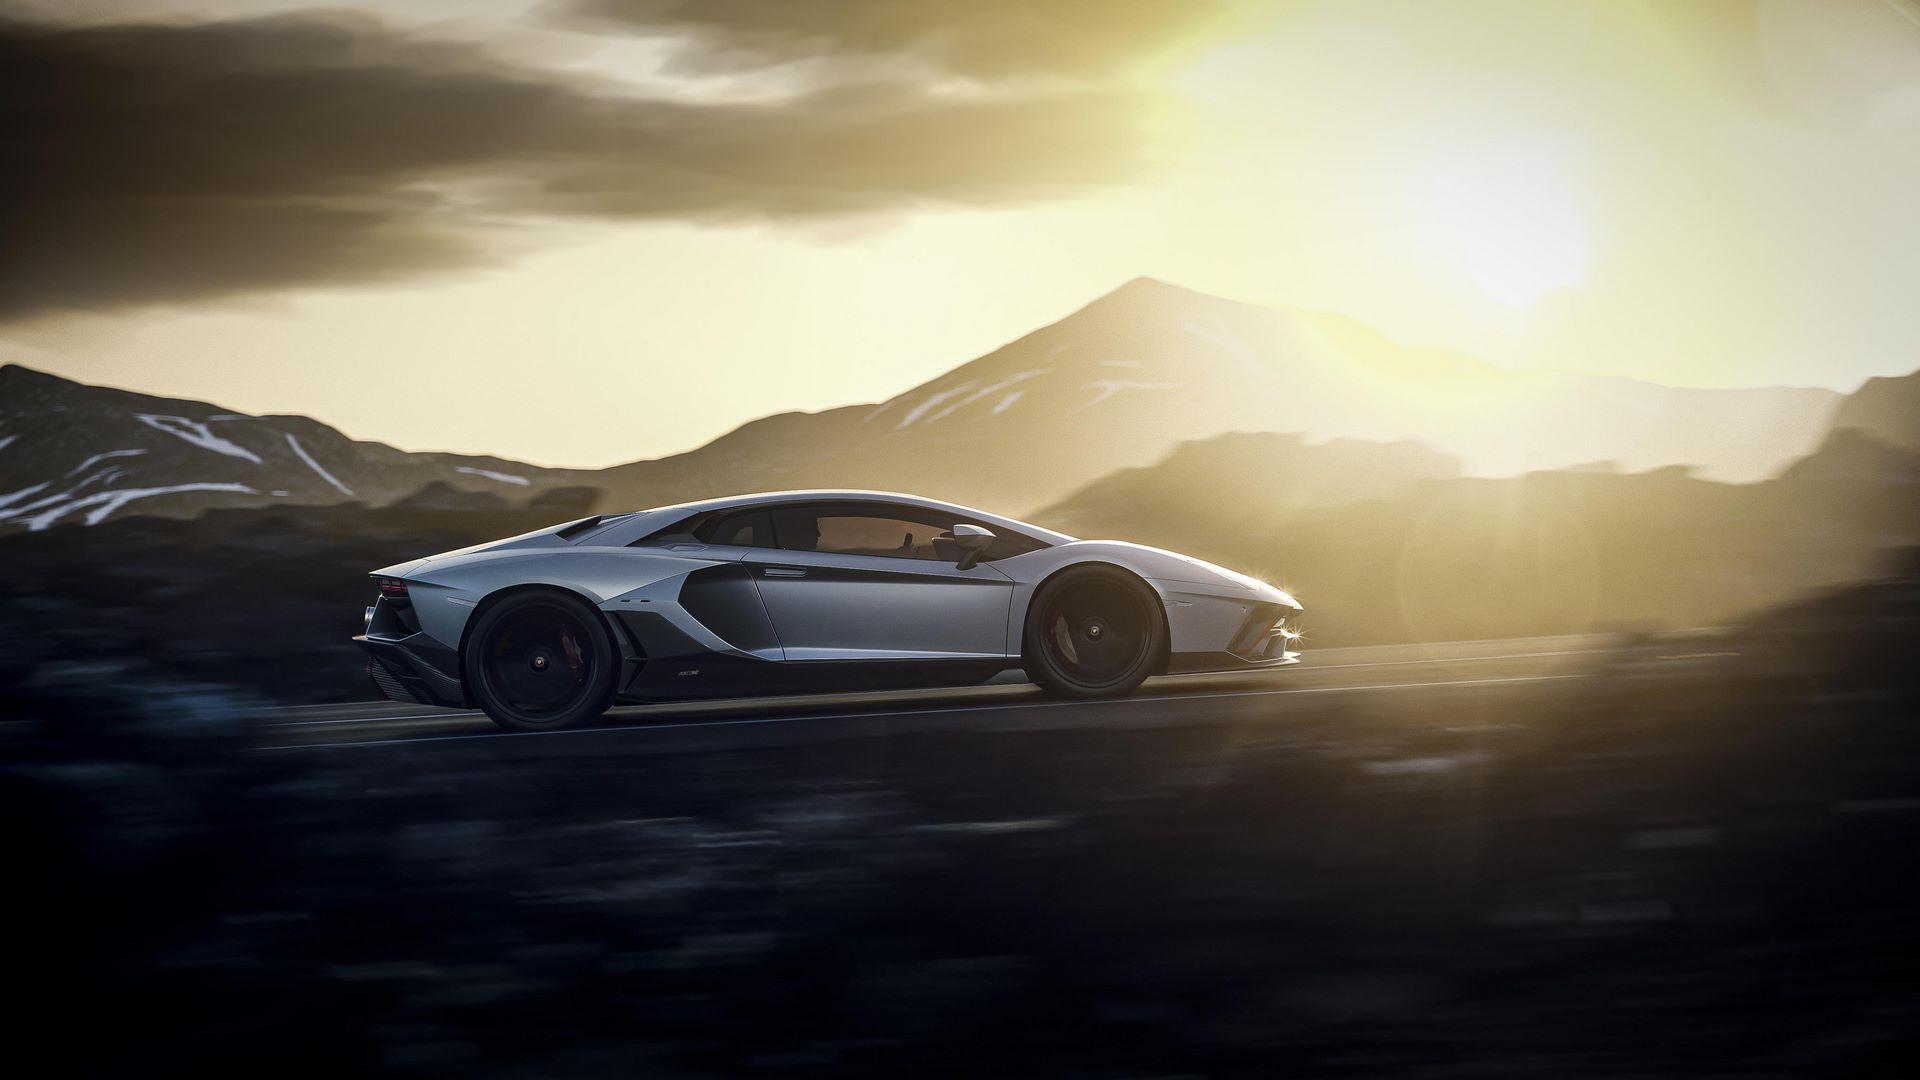 Lamborghini-Aventador-LP780-4-Ultimae-5